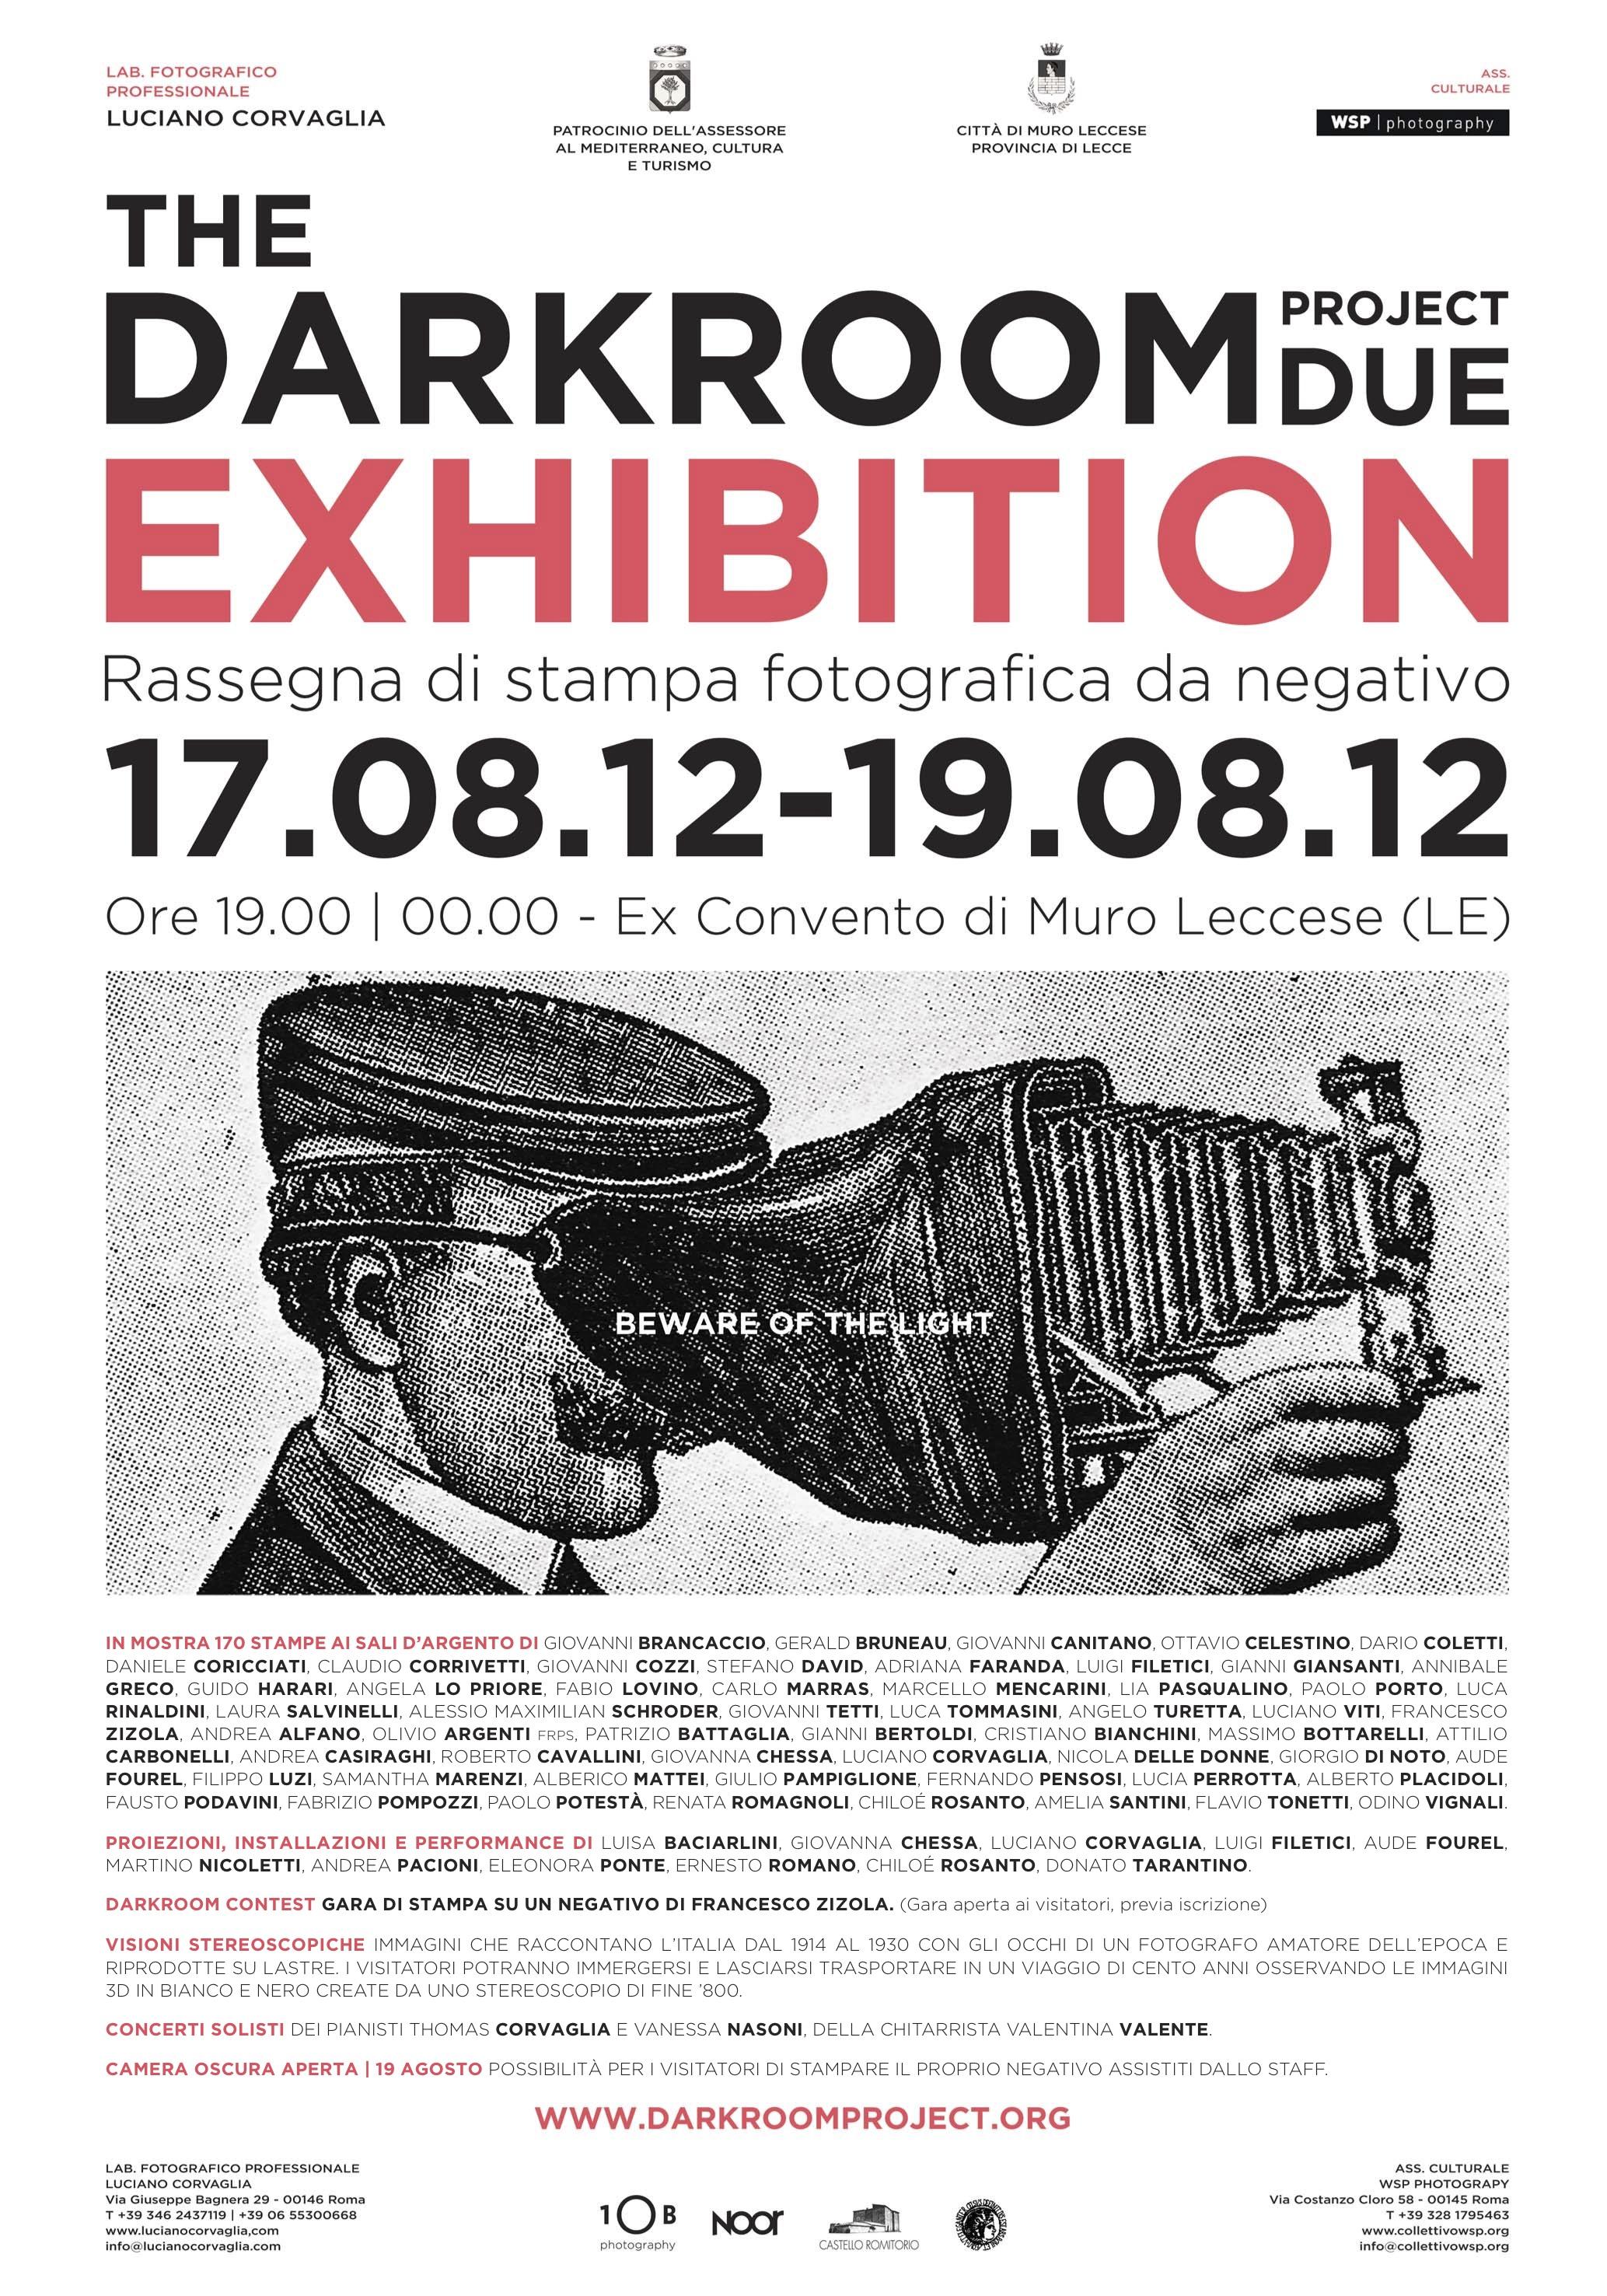 The Darkroom Project 2